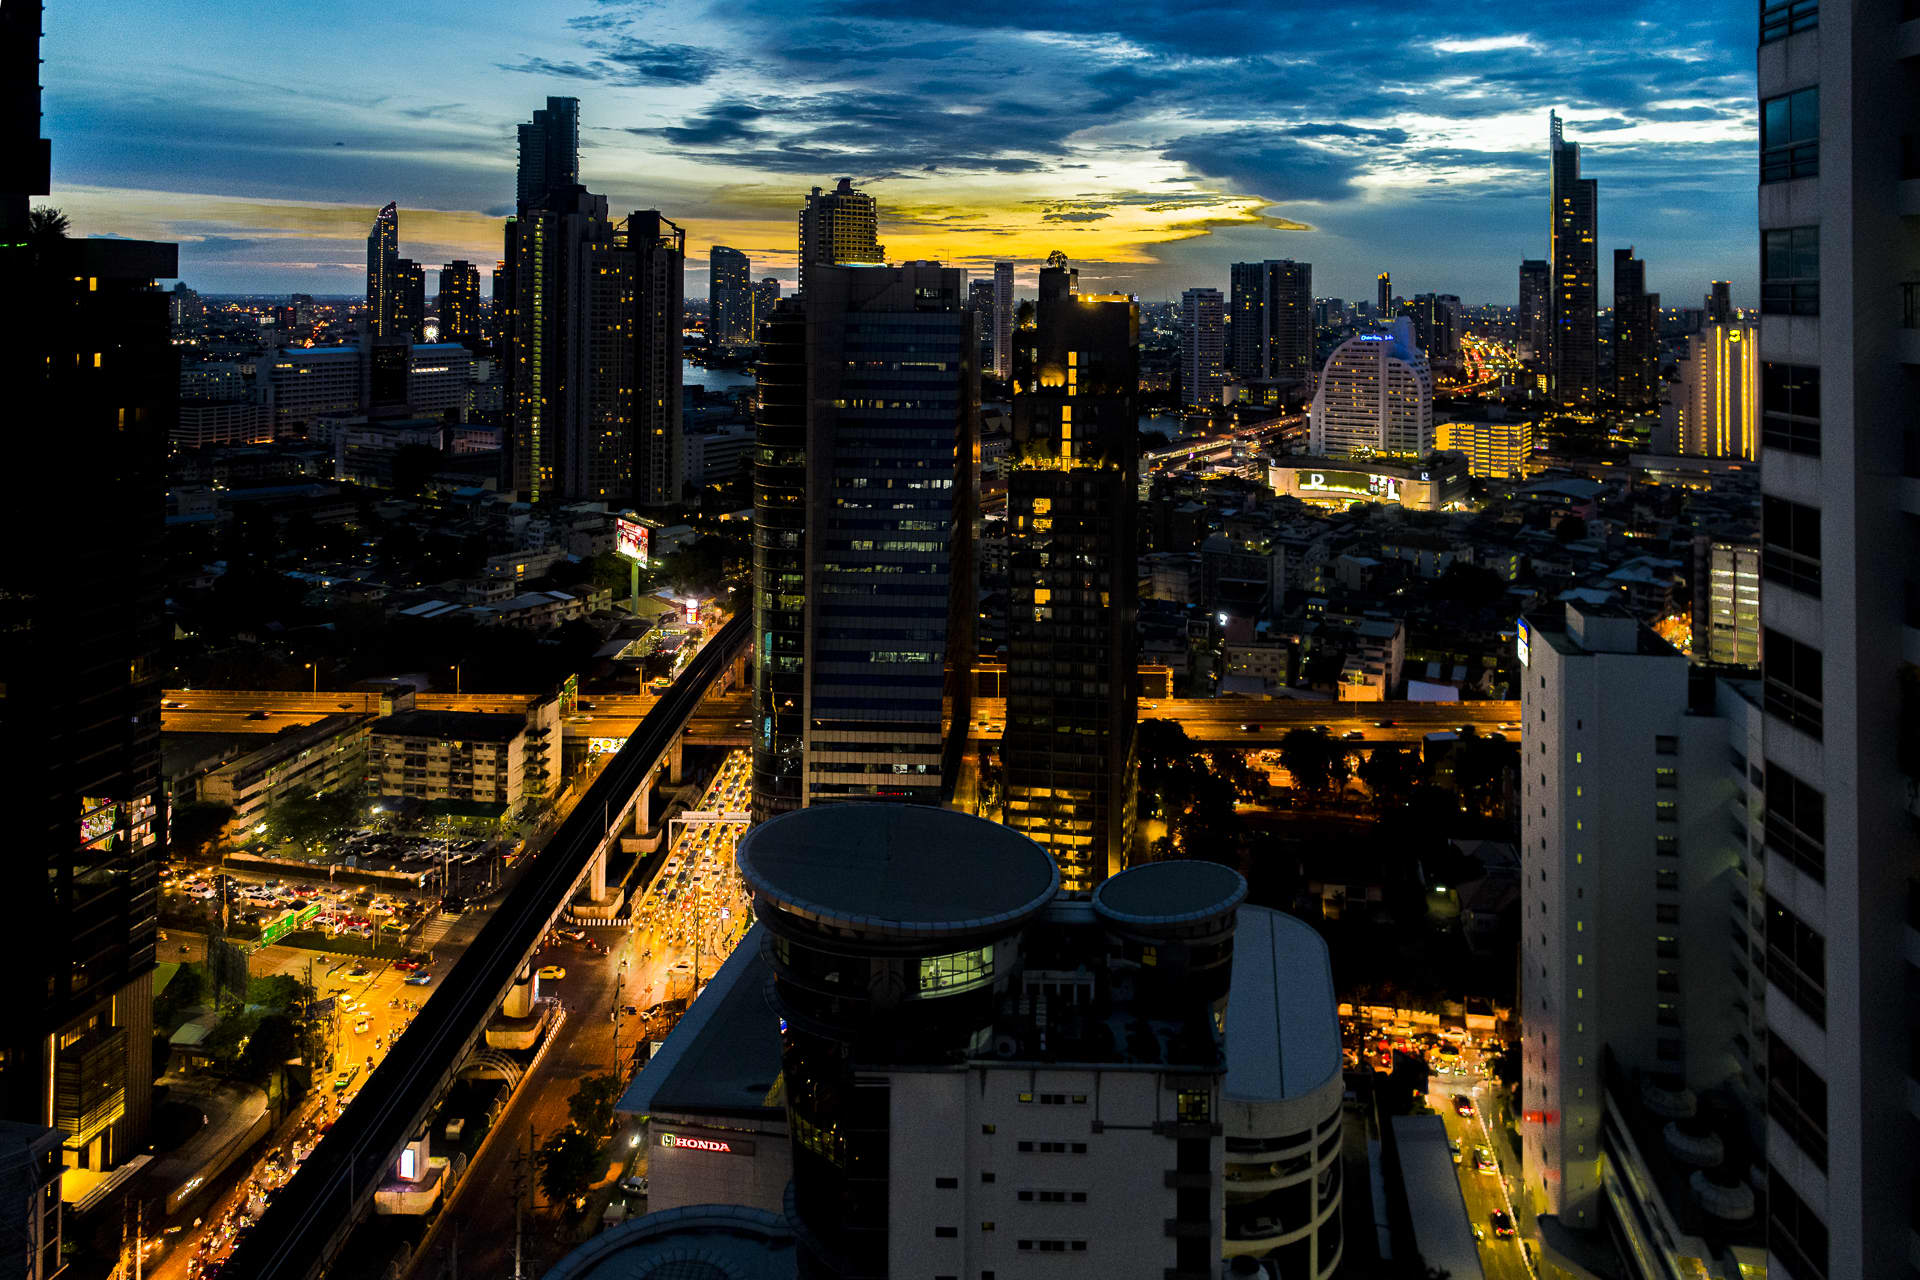 The sunset over bustling Bangkok.